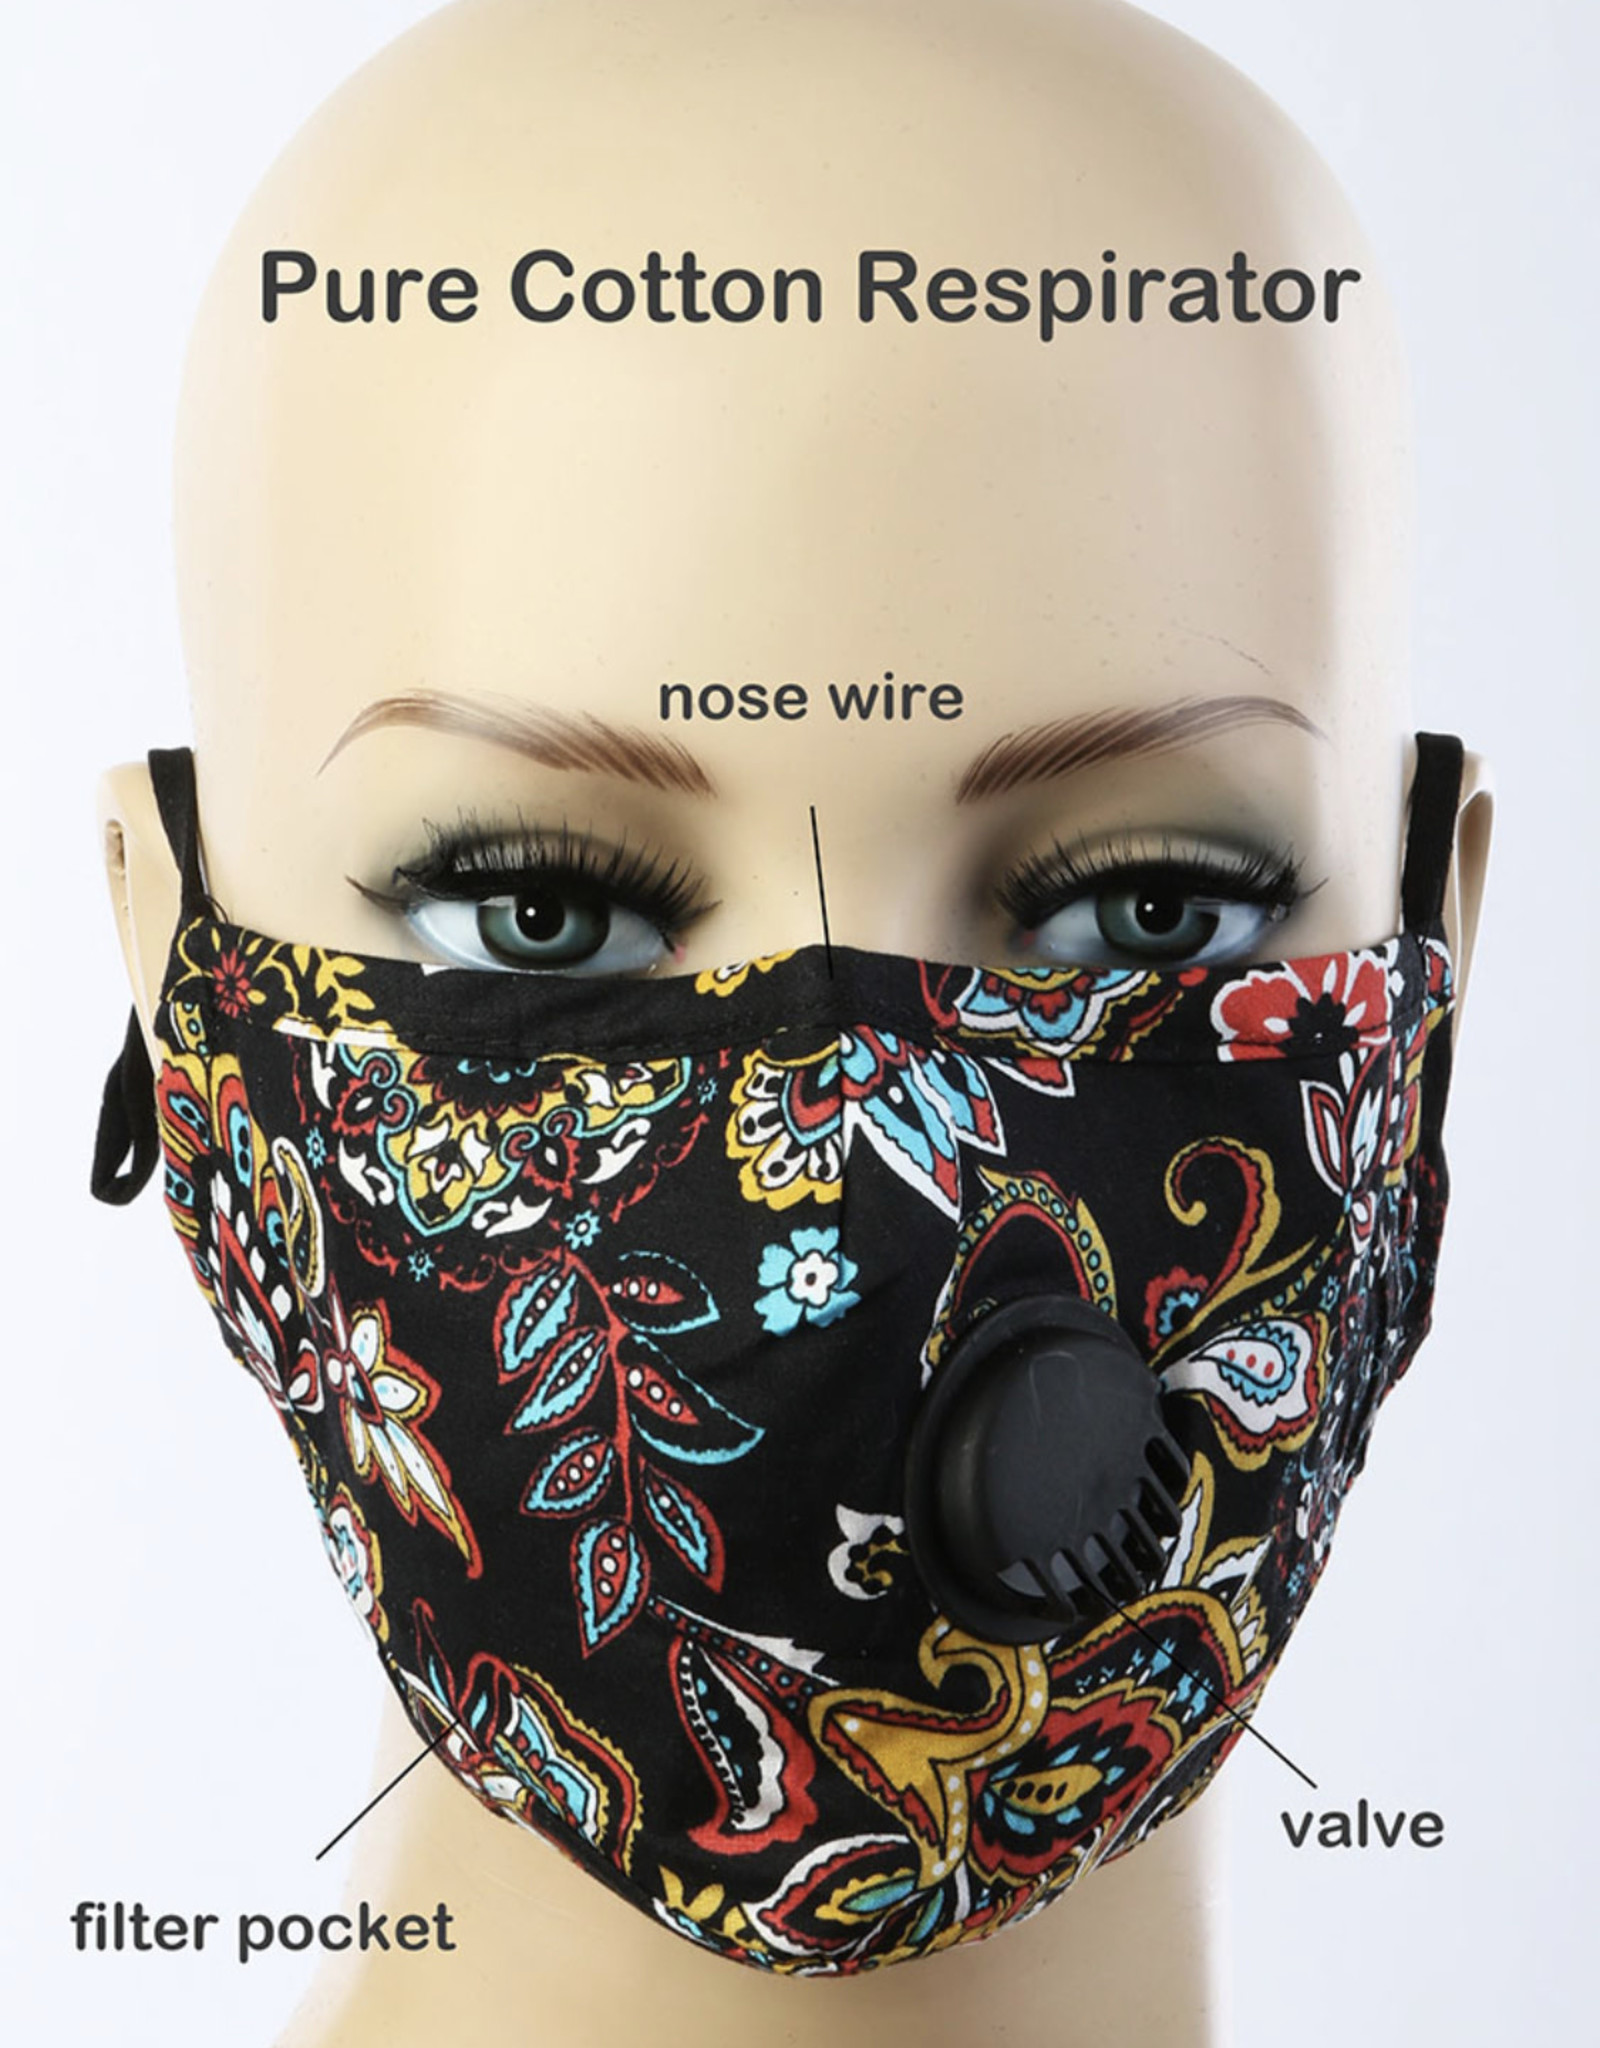 FACE MASK COTTON EZ BREATHE RESPIRATOR W/ FILTER POCKET BLACK PAISLEY FLORAL